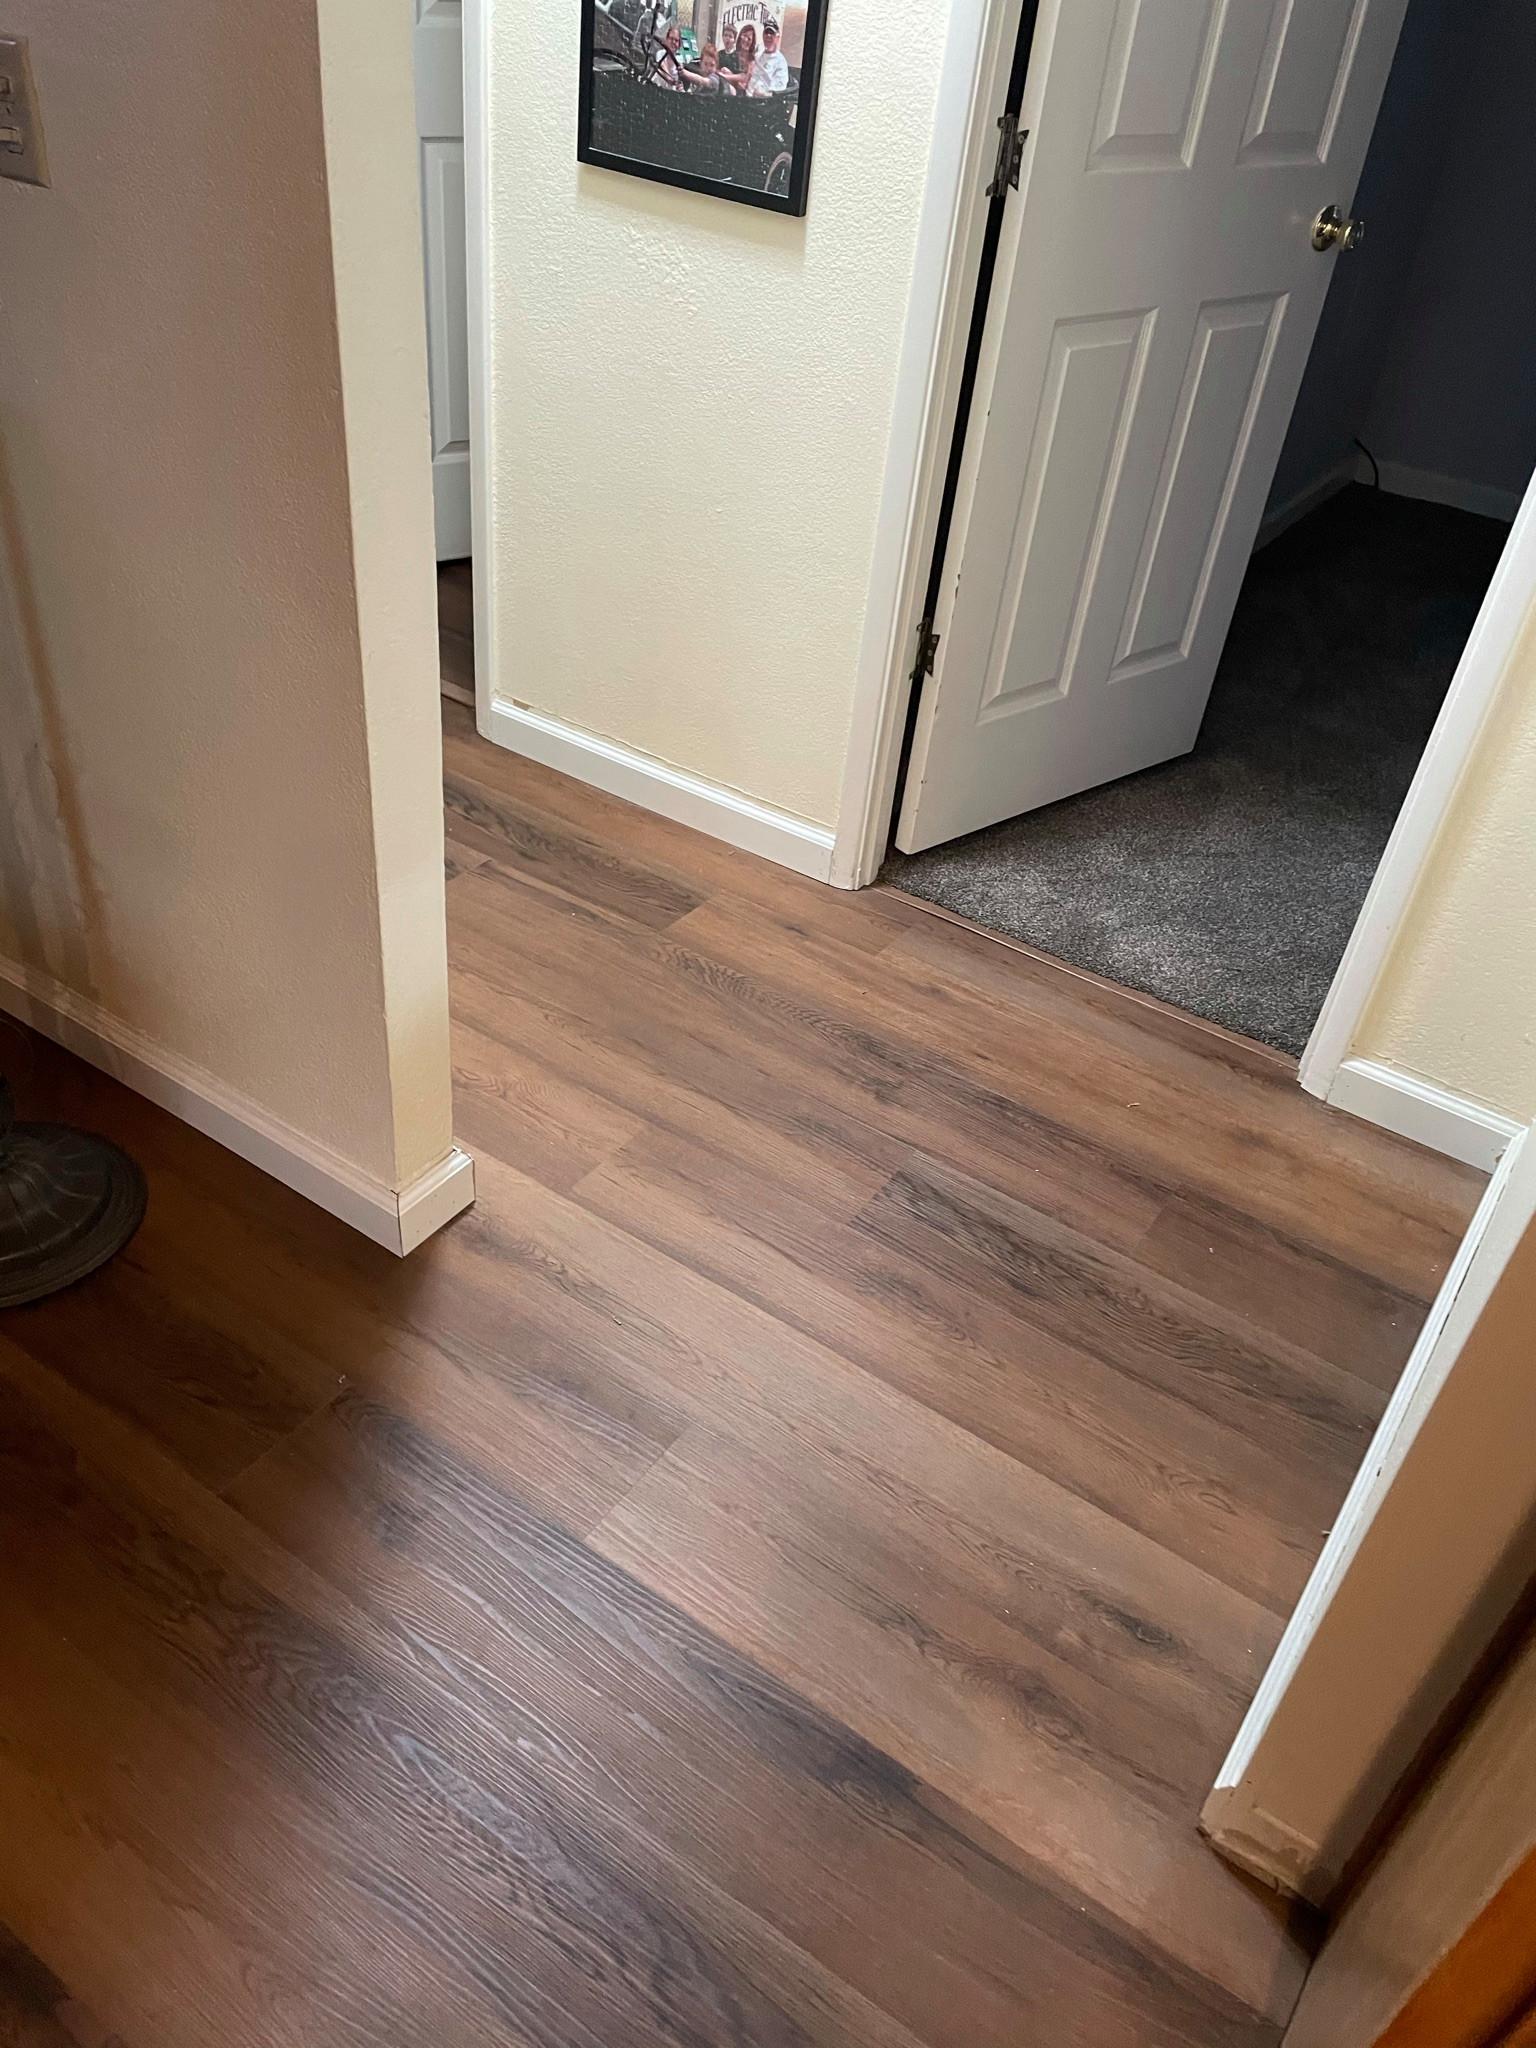 Hallway Leading to Master Bedroom